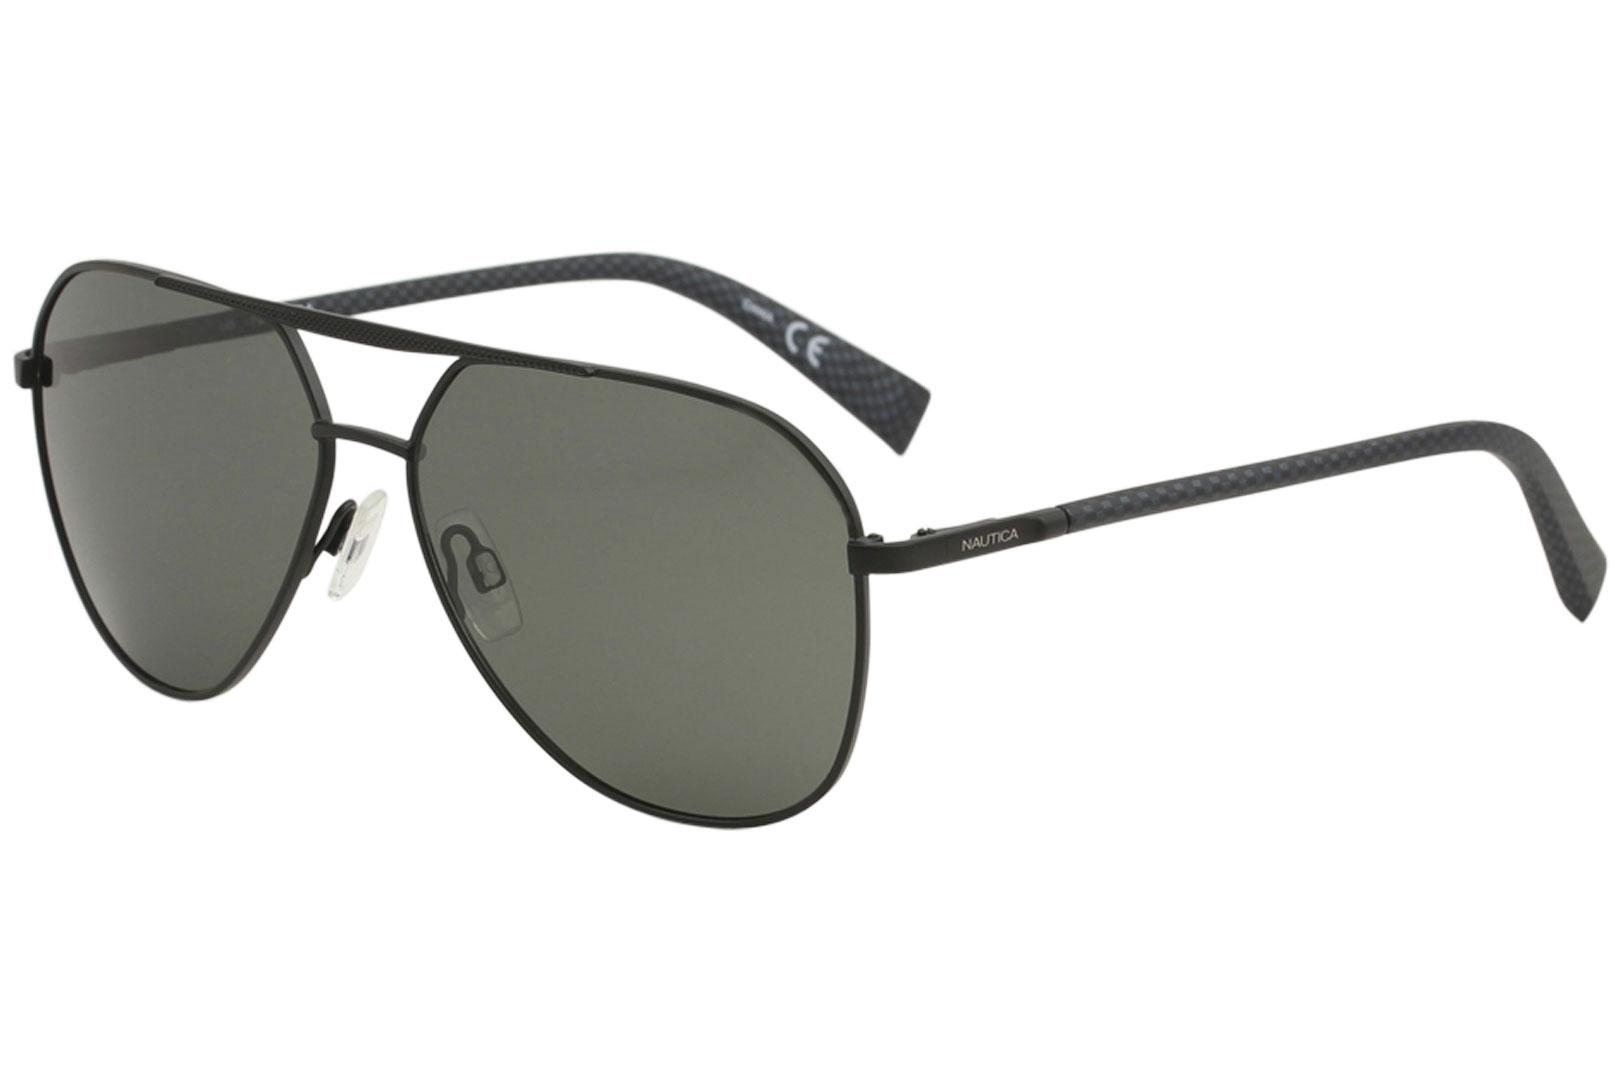 d0098ac98a Nautica Men s N5121S N 5121 S Fashion Pilot Polarized Sunglasses